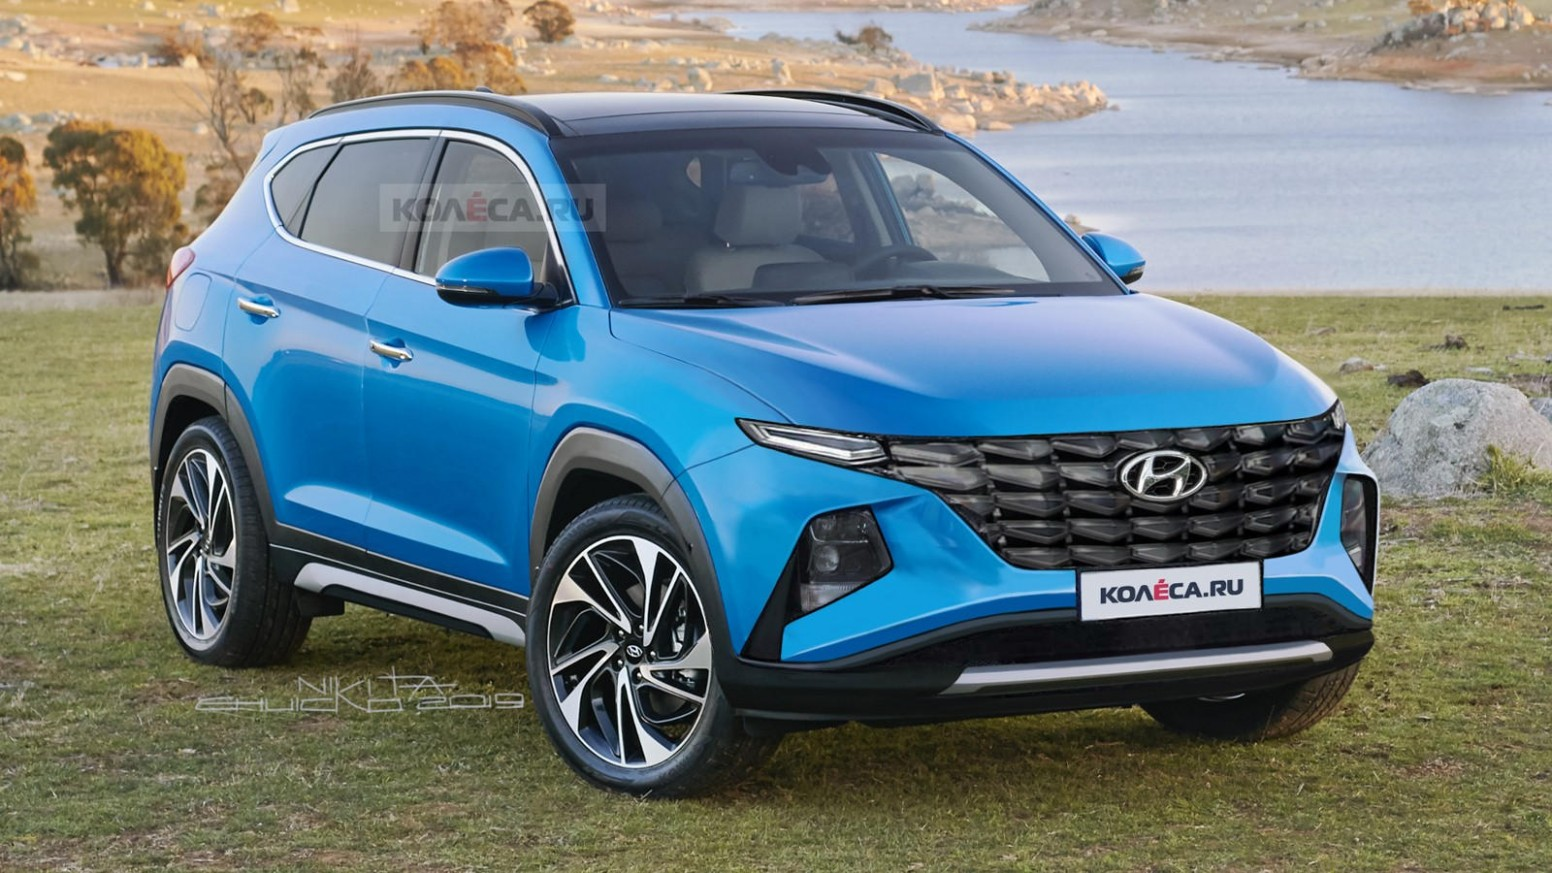 5 Hyundai Tucson Will Look Radically Different CarBuzz - Hyundai Tucson Redesign 2021